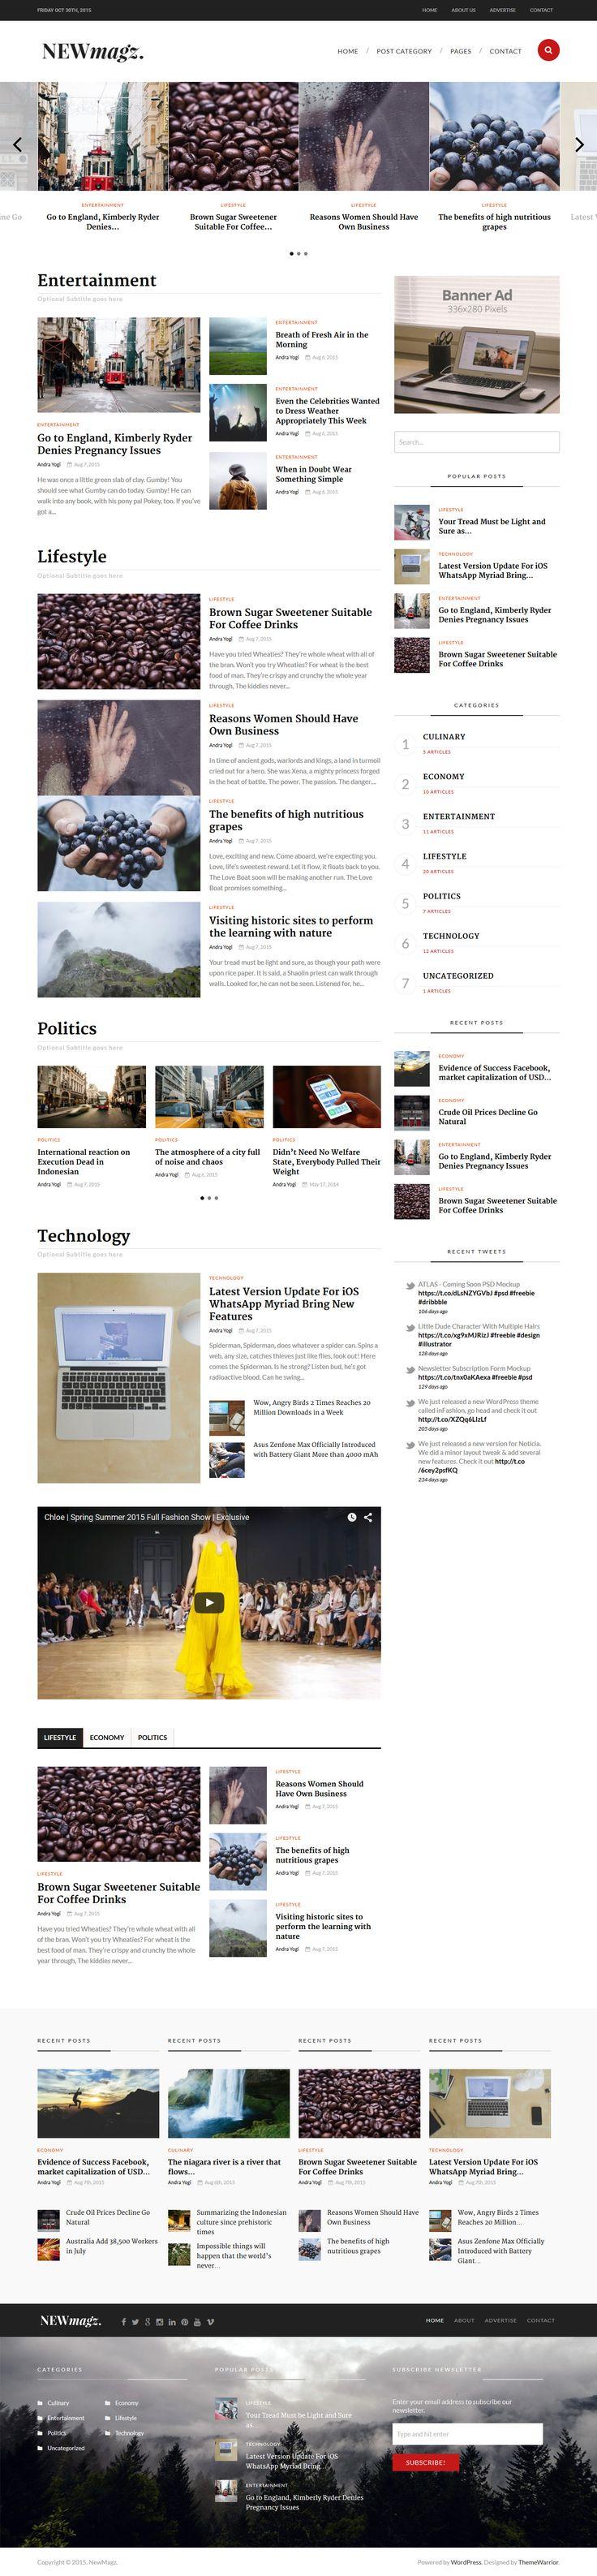 NewMagz - WordPress Magazine Theme #wpress Download: http://themeforest.net/item/newmagz-wordpress-magazine-theme/12845644?ref=ksioks